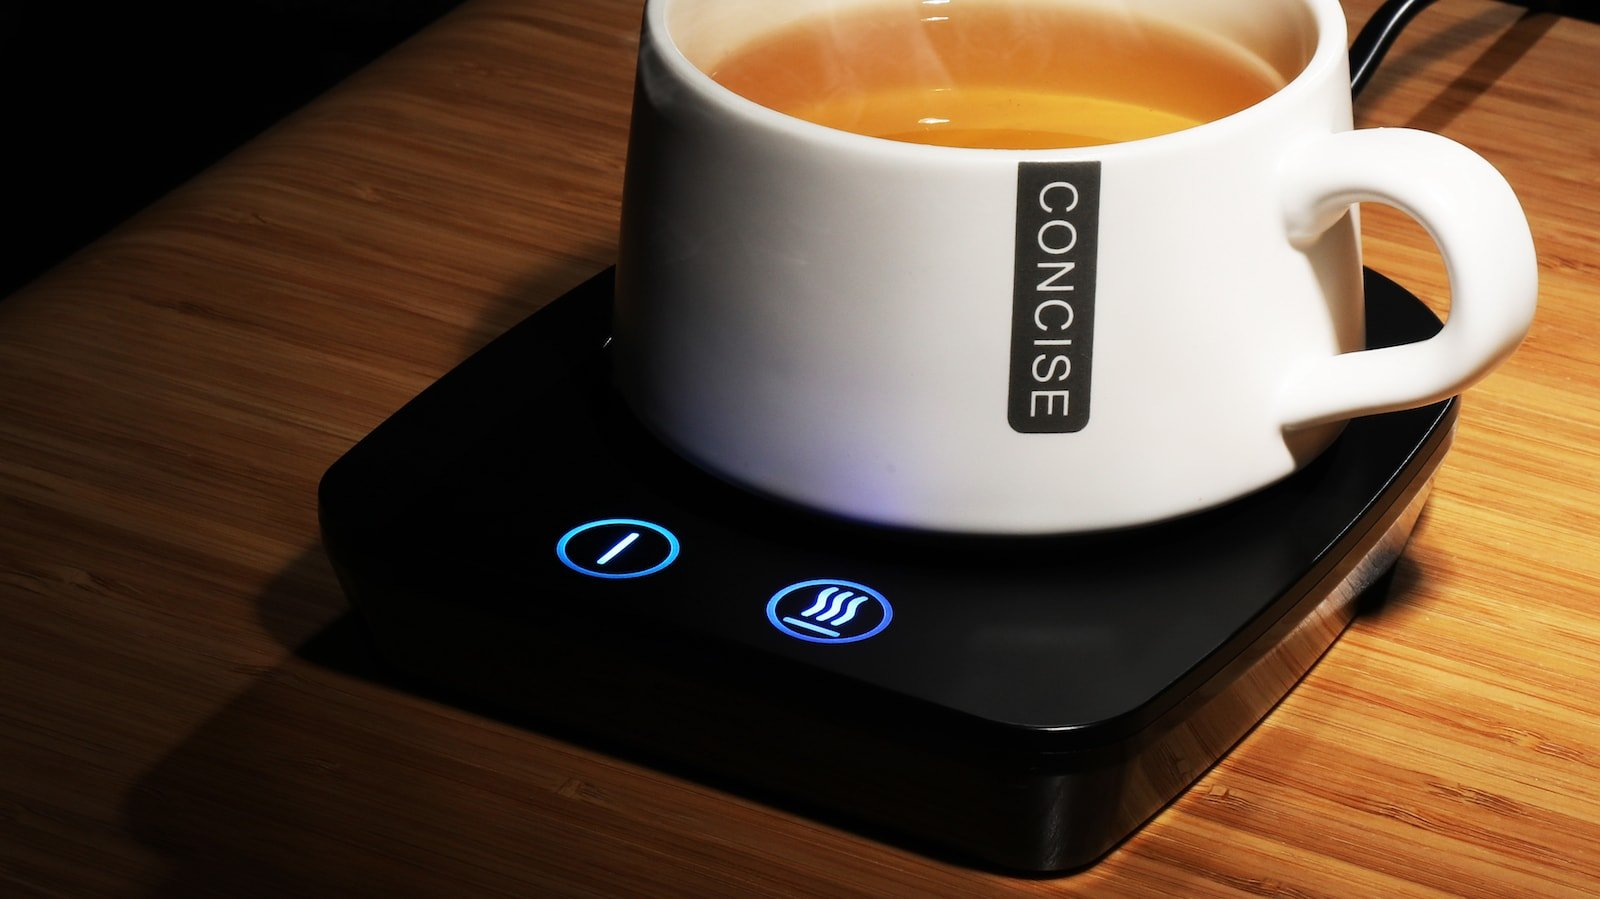 VOBAGA Coffee Mug Warmer has three temperature settings